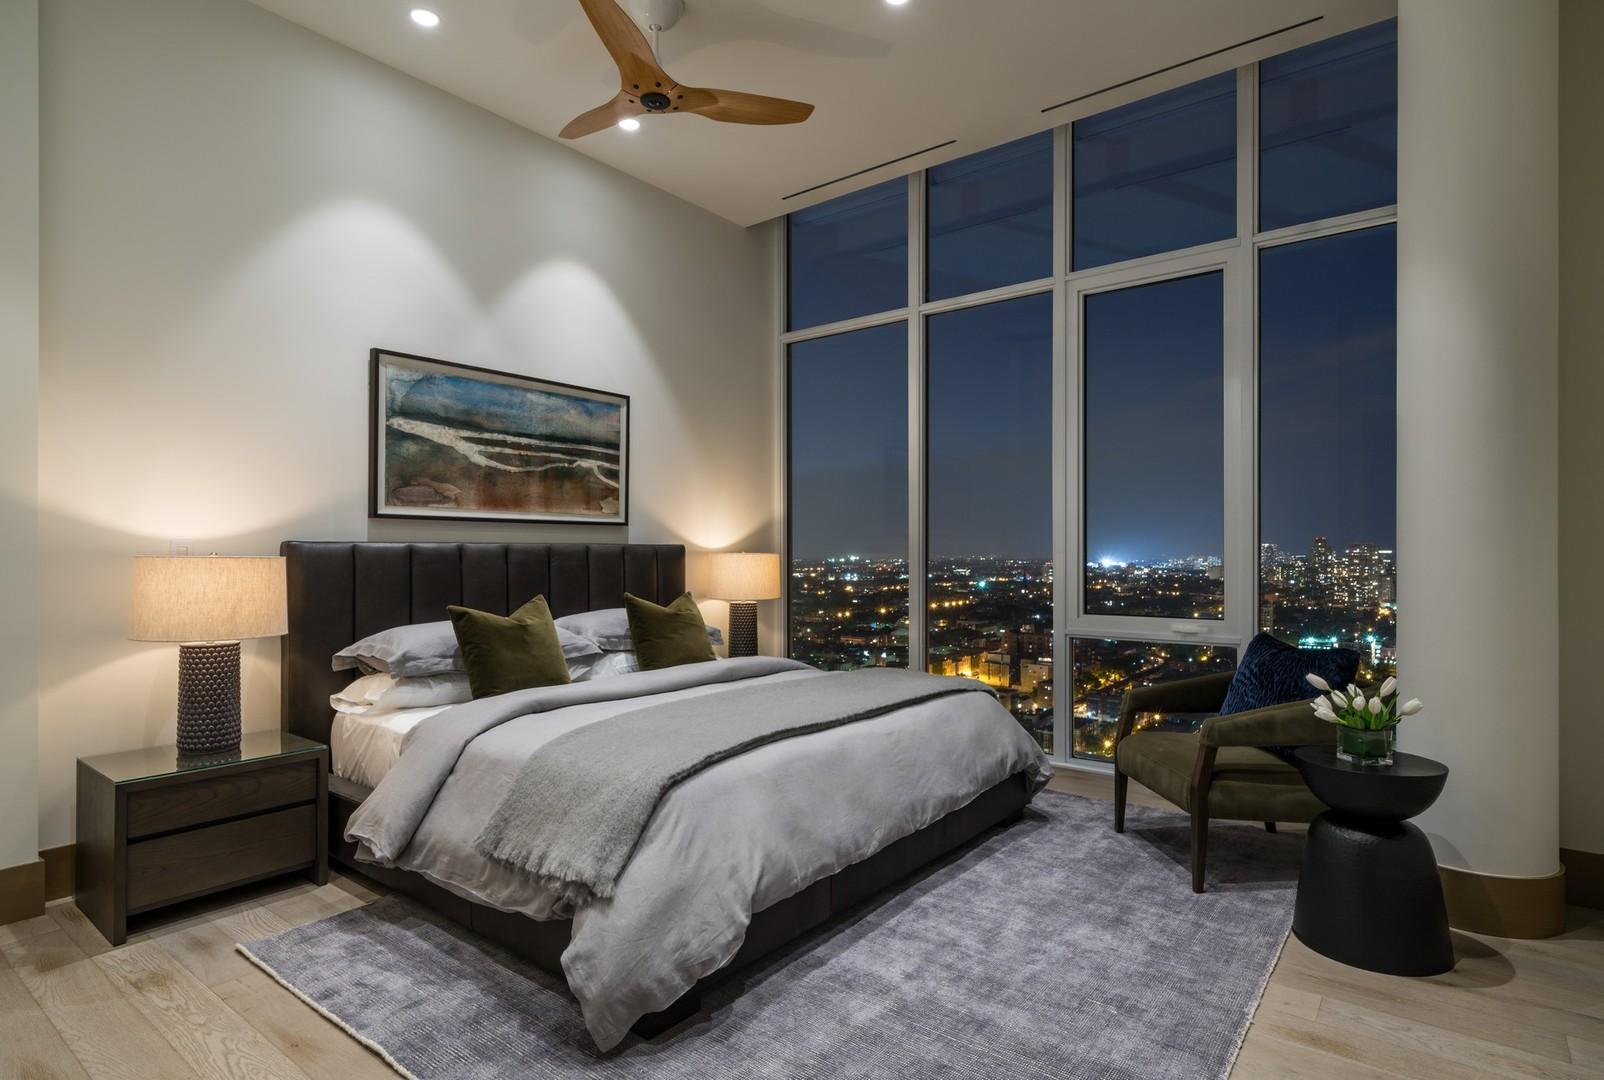 Bedroom at Level Furnished Living, Near North Side, Chicago